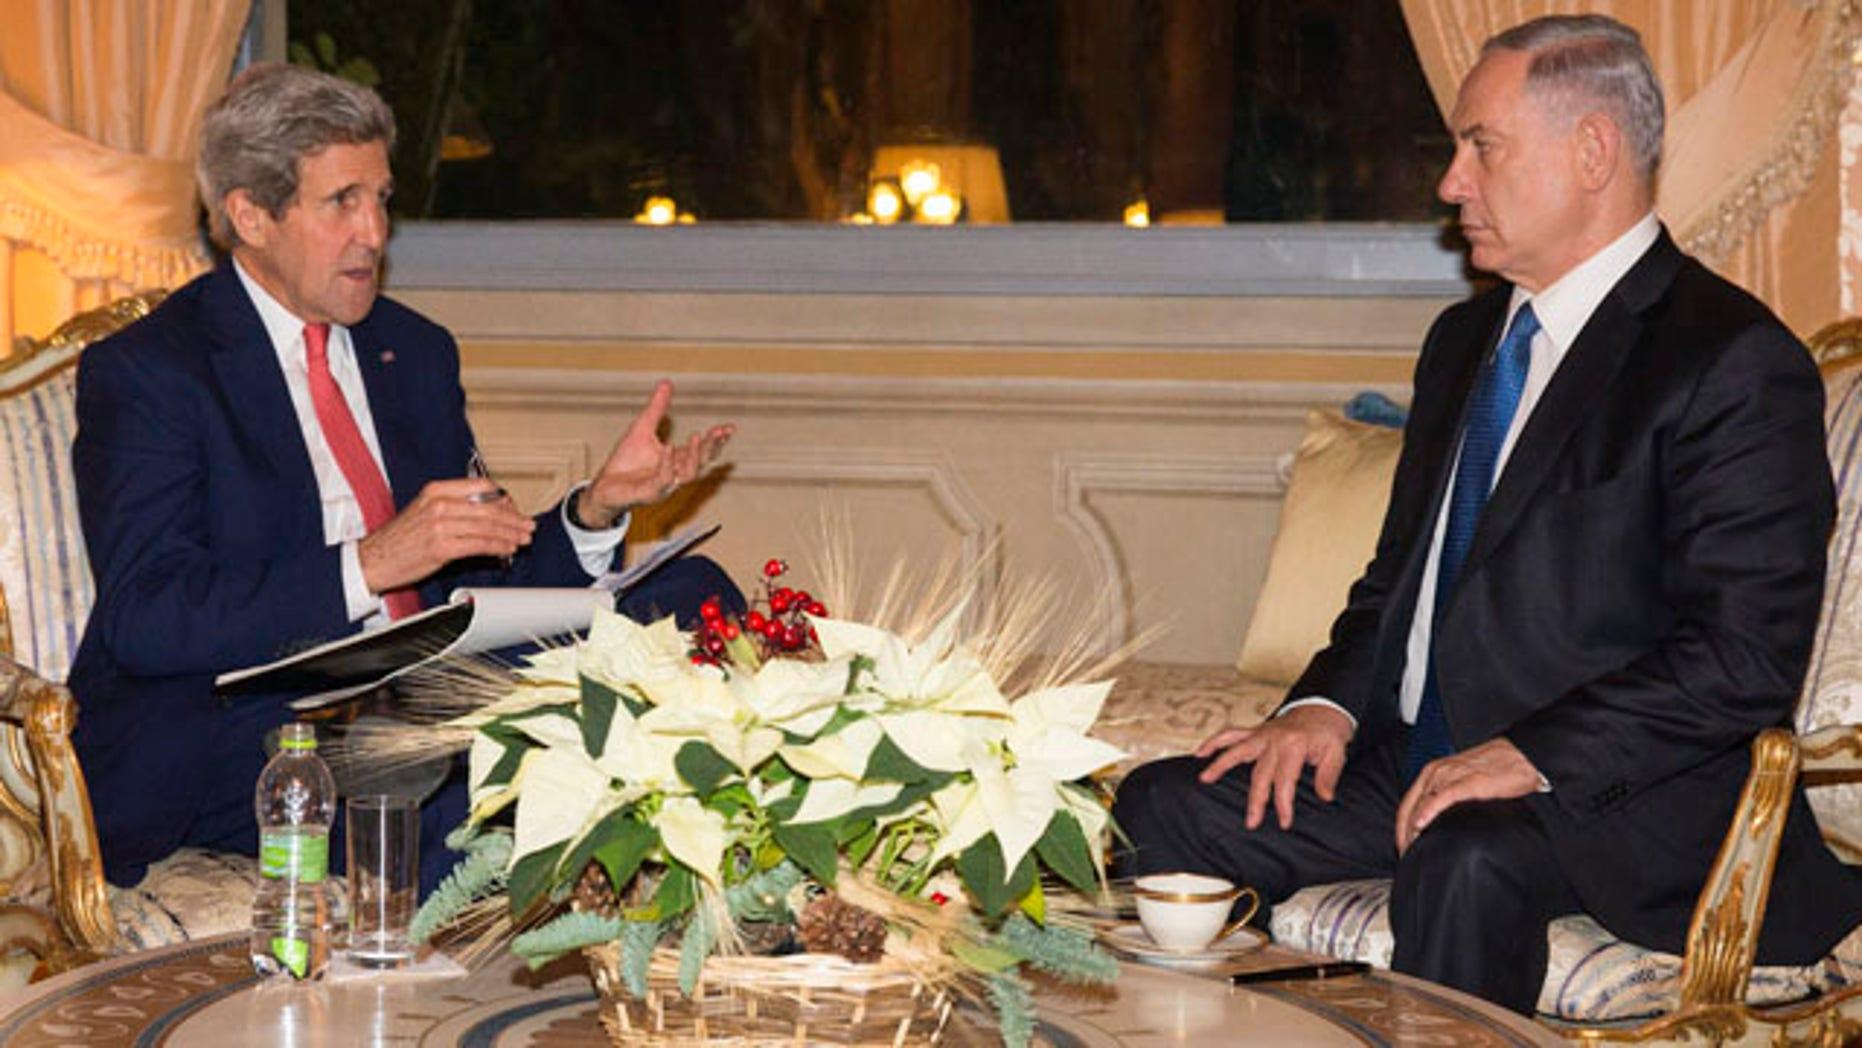 FILE - In this Dec. 15, 2014 file-pool photo, Secretary of State, John Kerry meets with Israel Prime Minister Benjamin Netanyahu at Villa Taverna in Rome. (AP Photo/Evan Vucci, File-Pool)